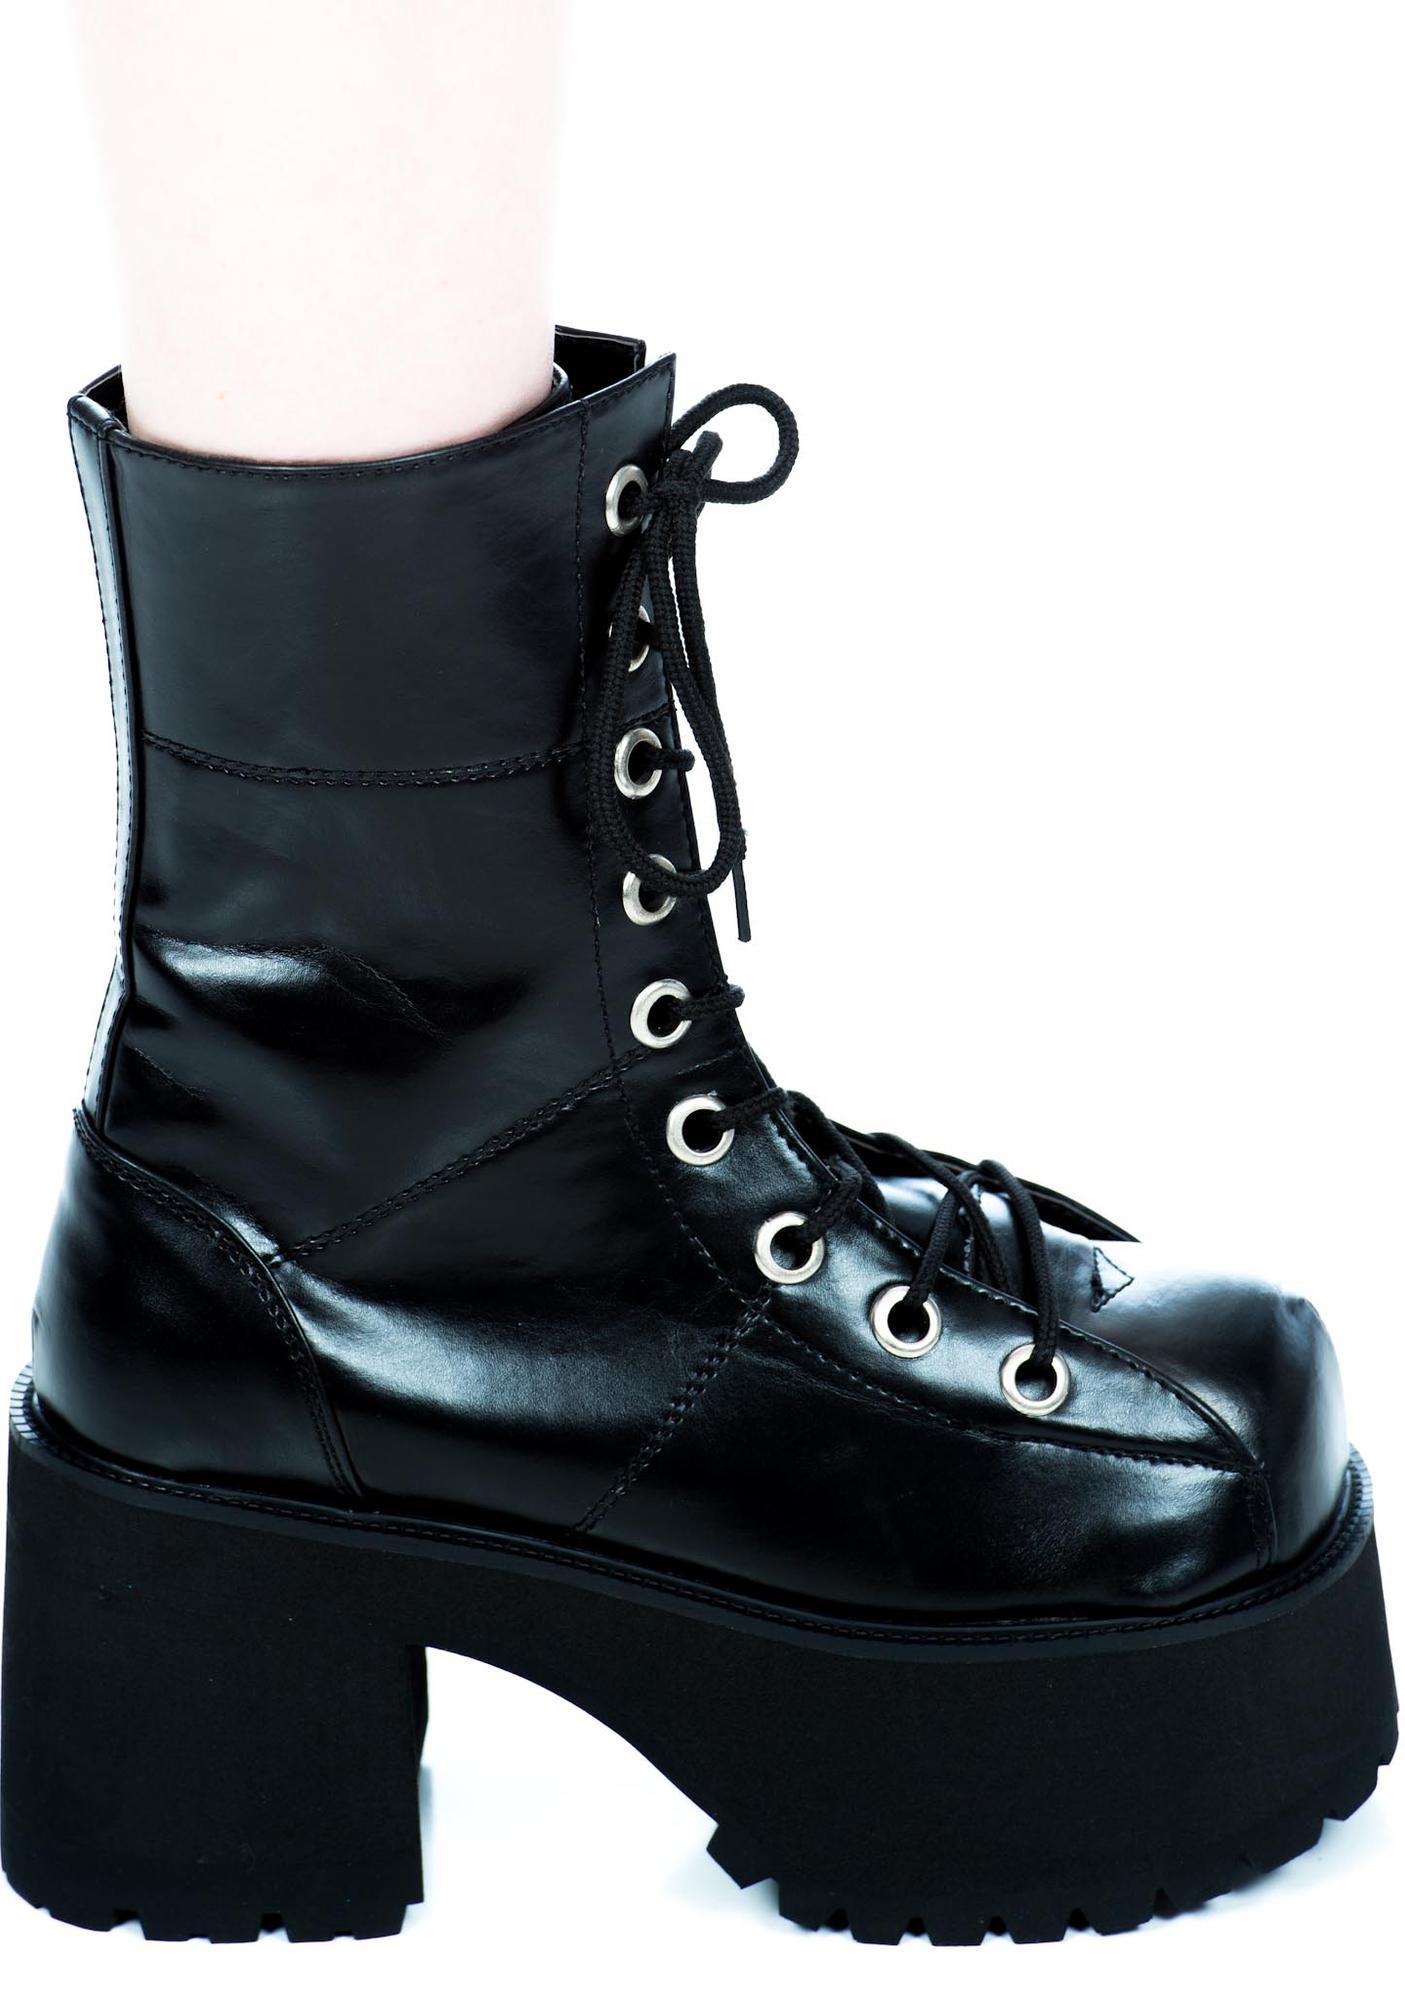 Demonia Ranger Boots